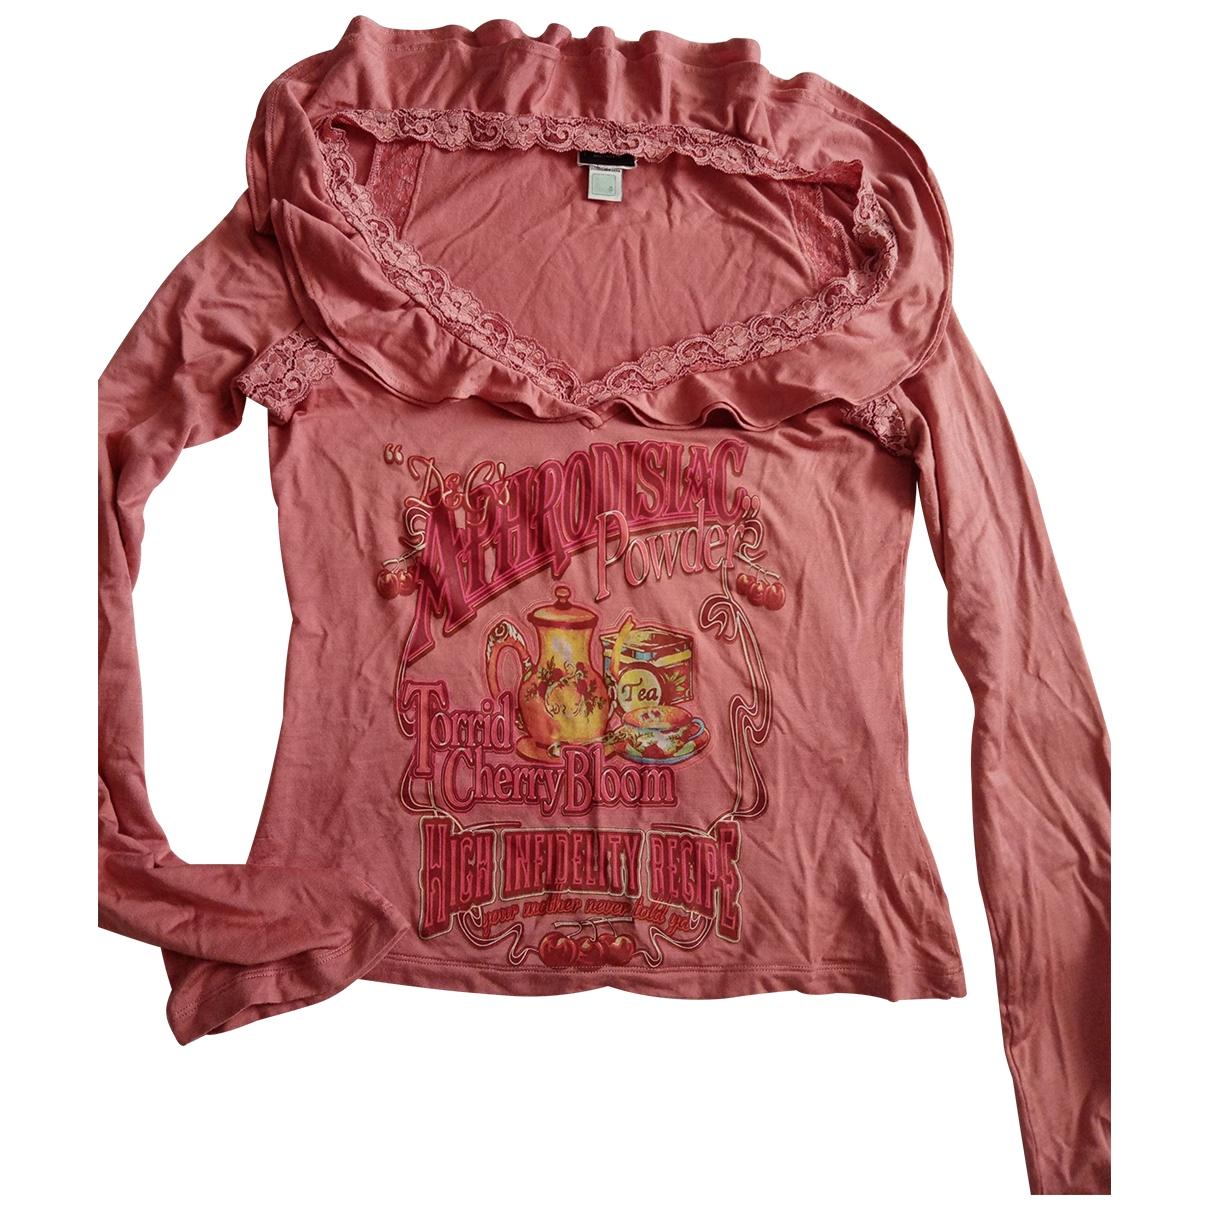 D&g \N Pink Cotton  top for Women M International